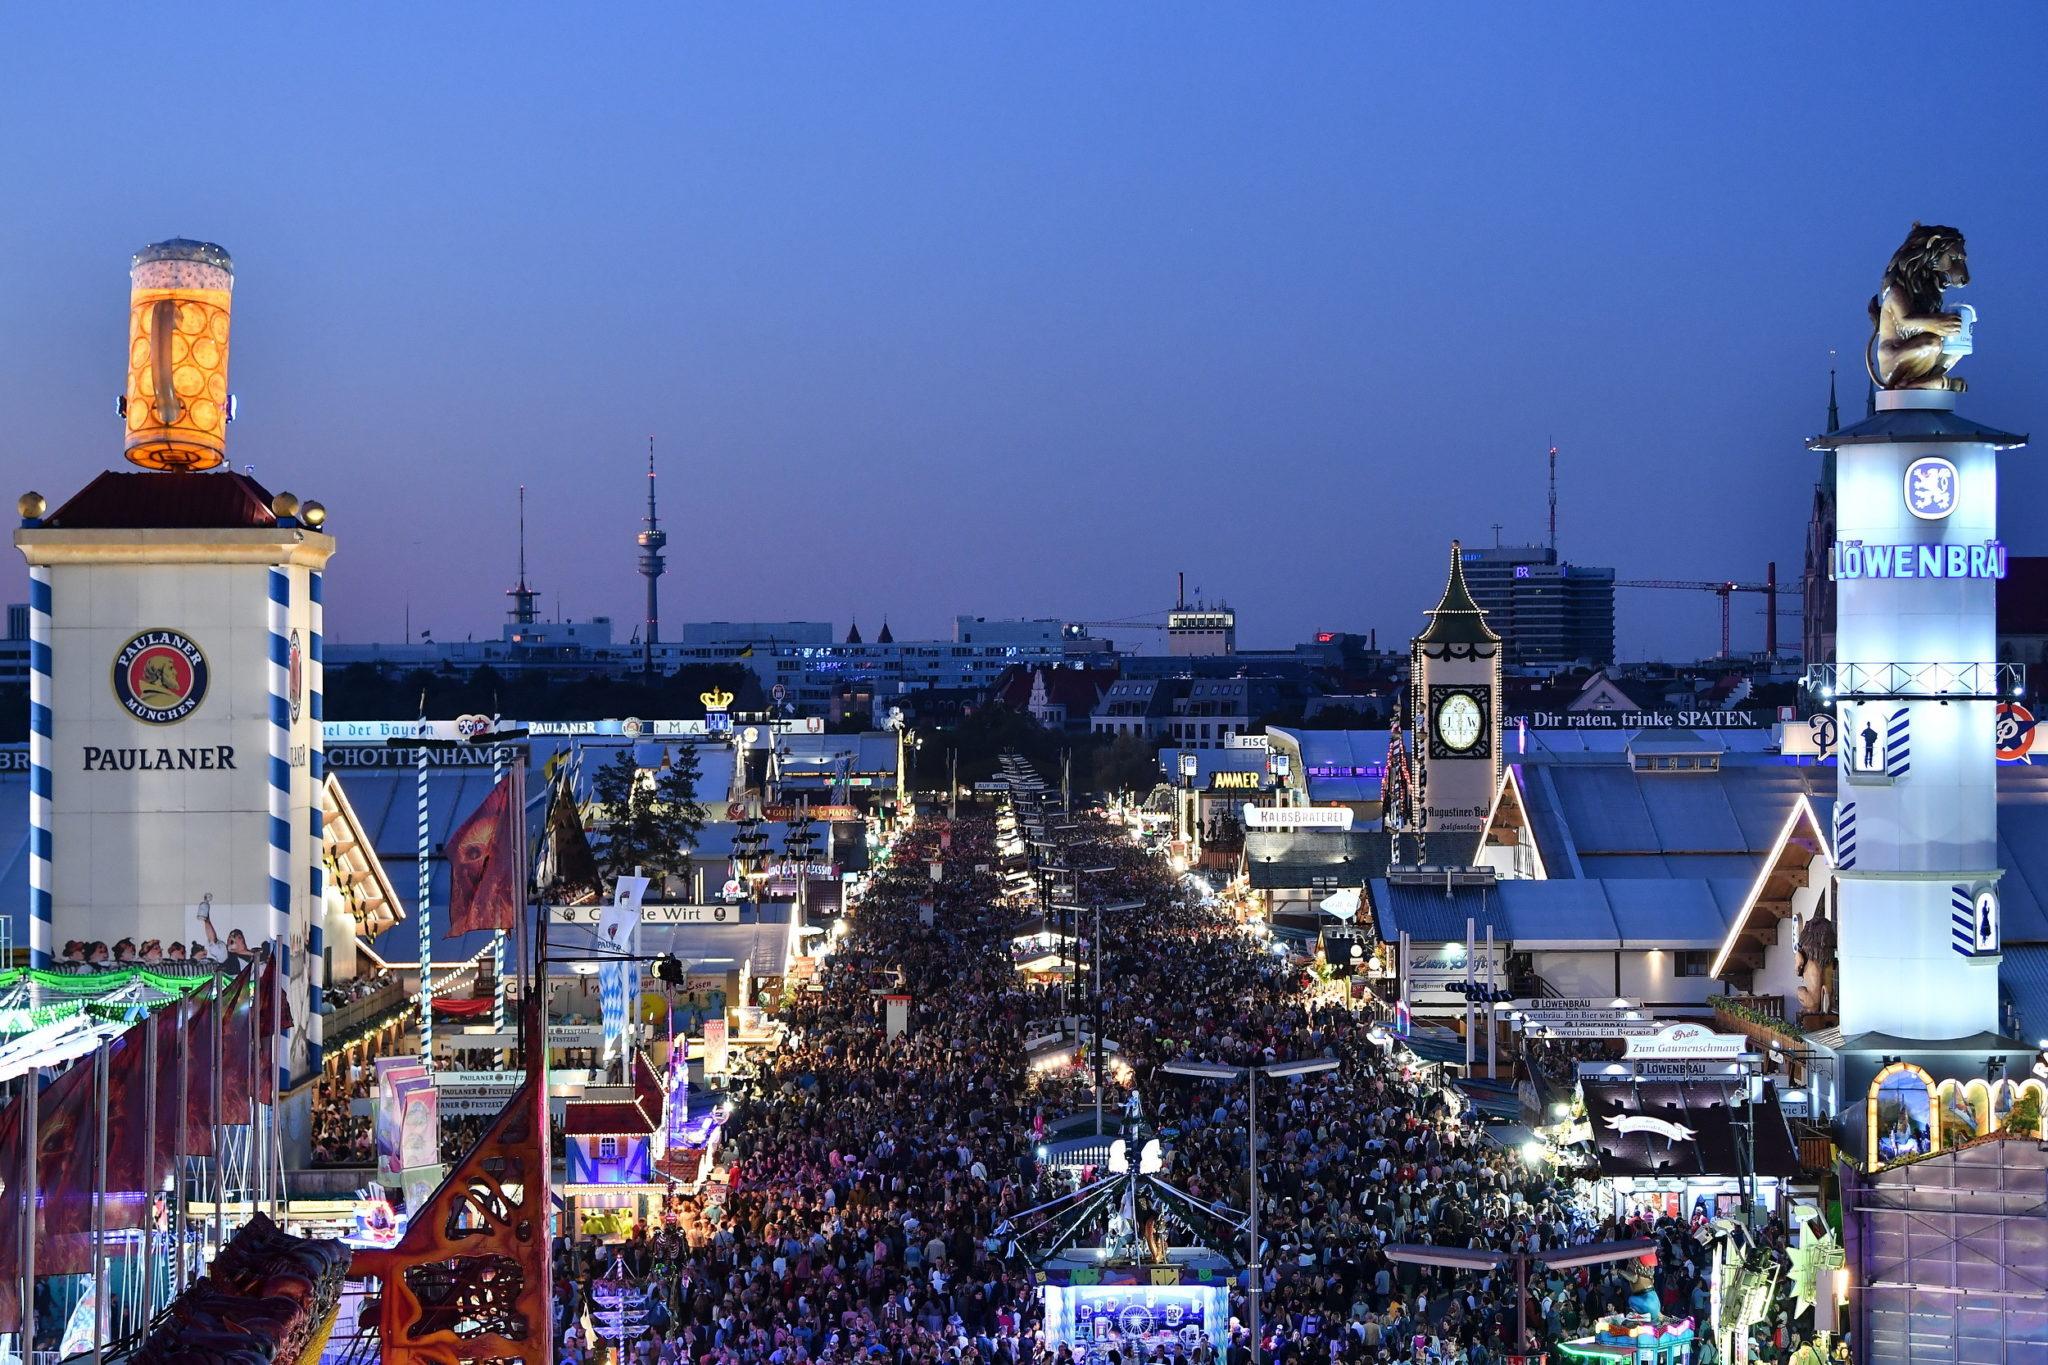 Niemcy, Monachium, trwaOktoberfest, fot. PHILIPP GUELLAND, PAP/EPA